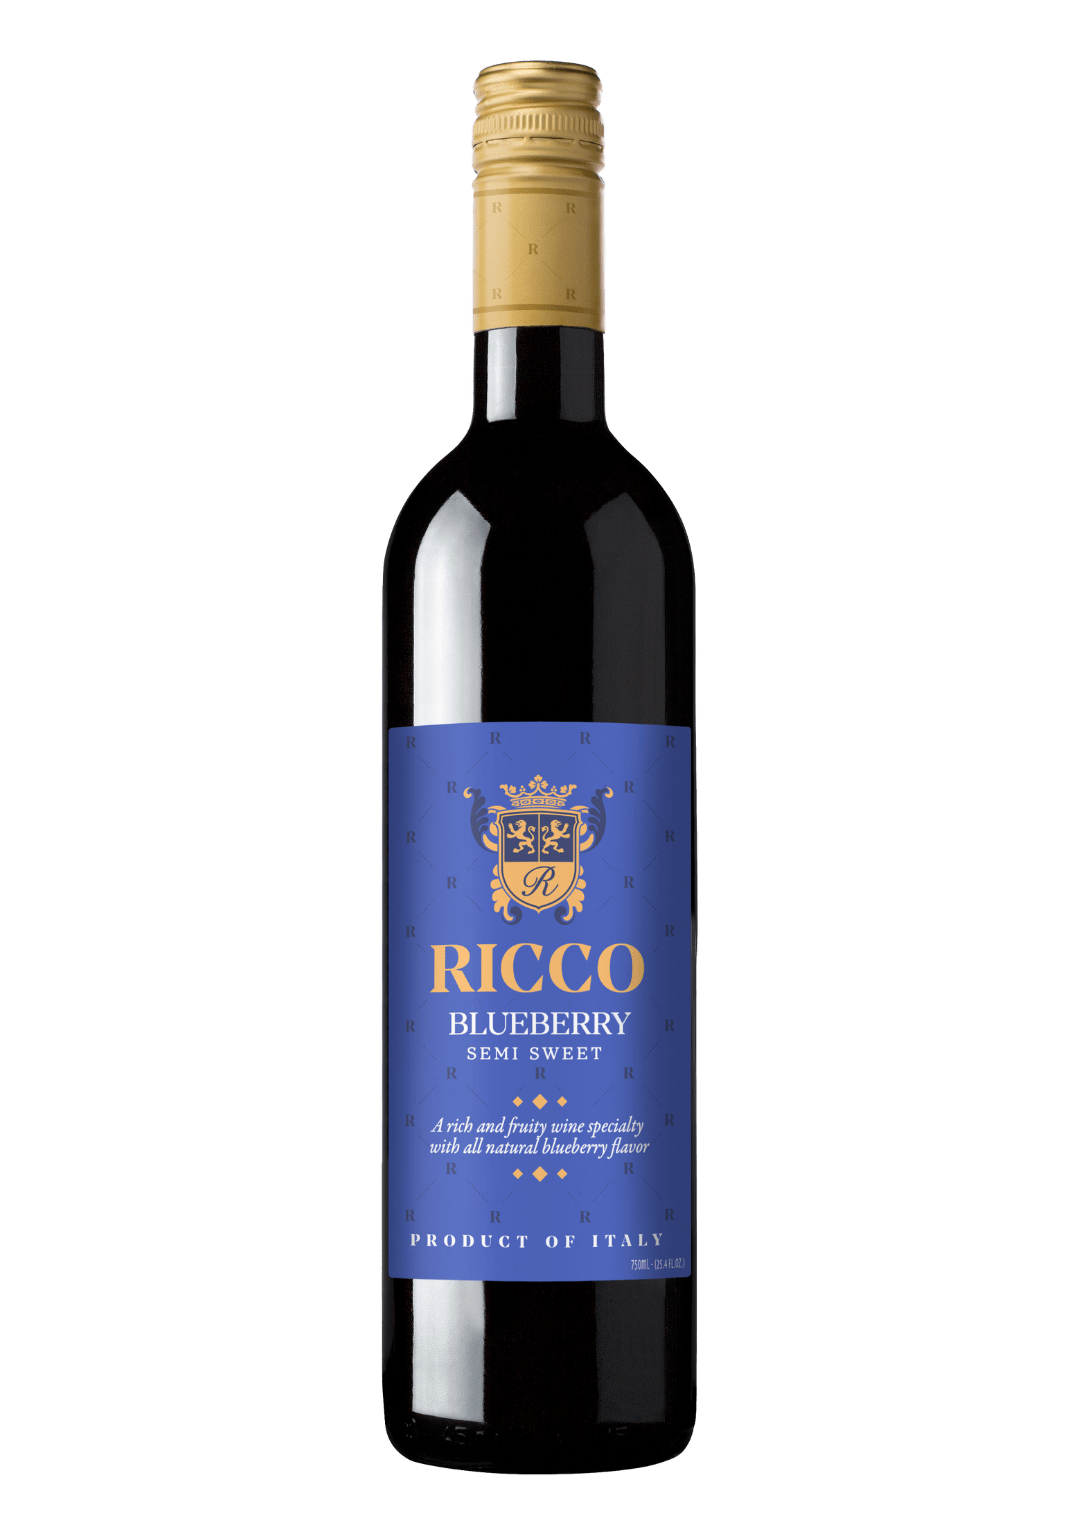 Ricco Blueberry